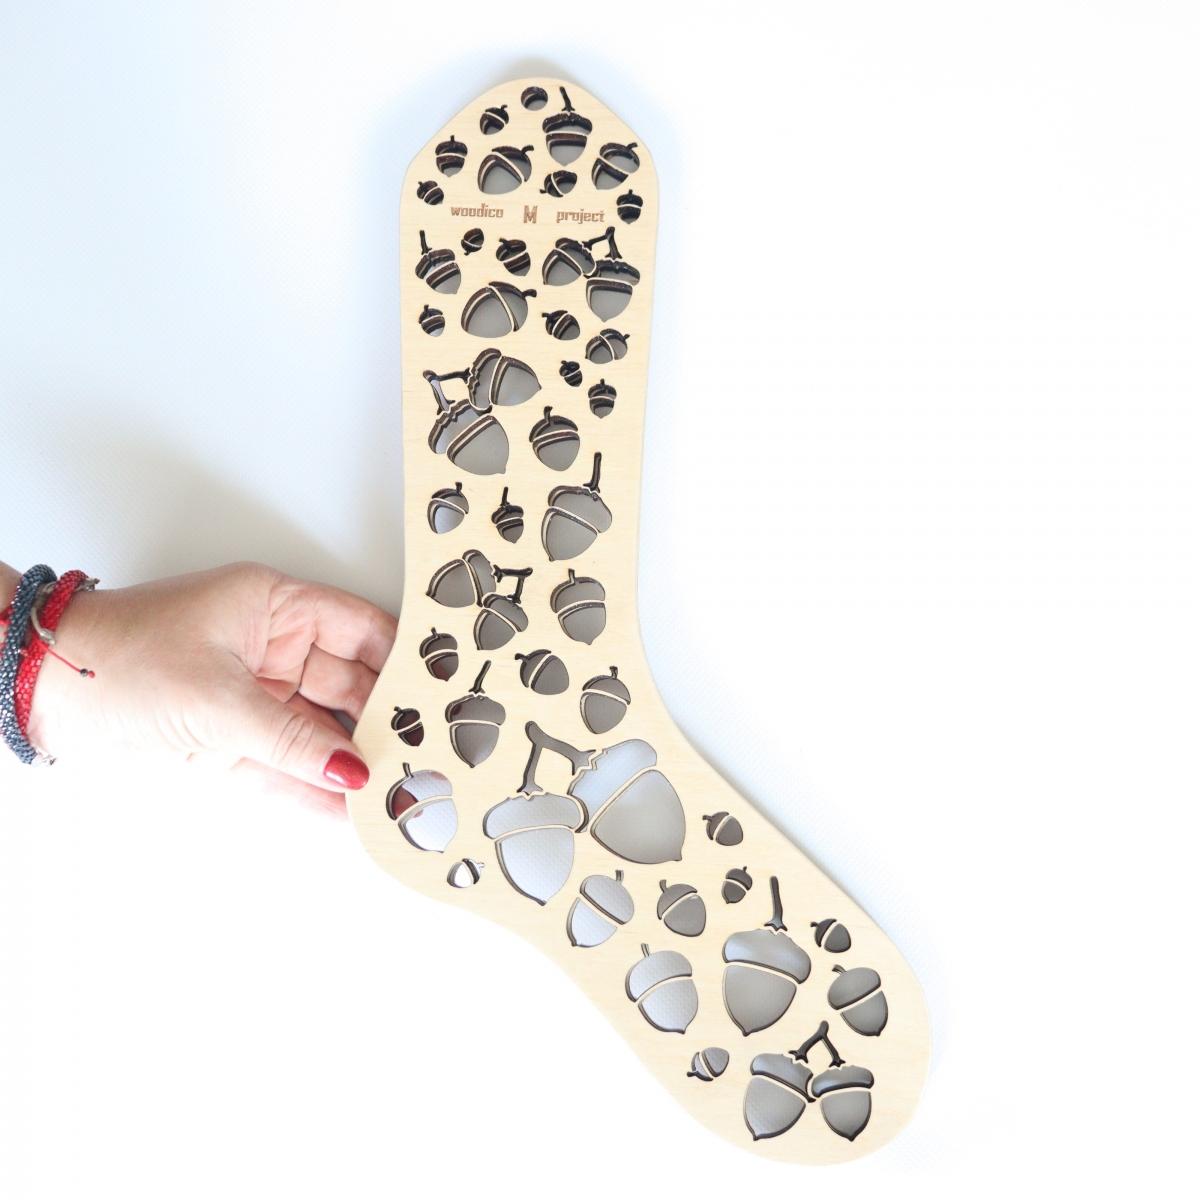 woodico.pro wooden sock blockers acorns 3 1200x1200 - Wooden sock blockers / Acorns